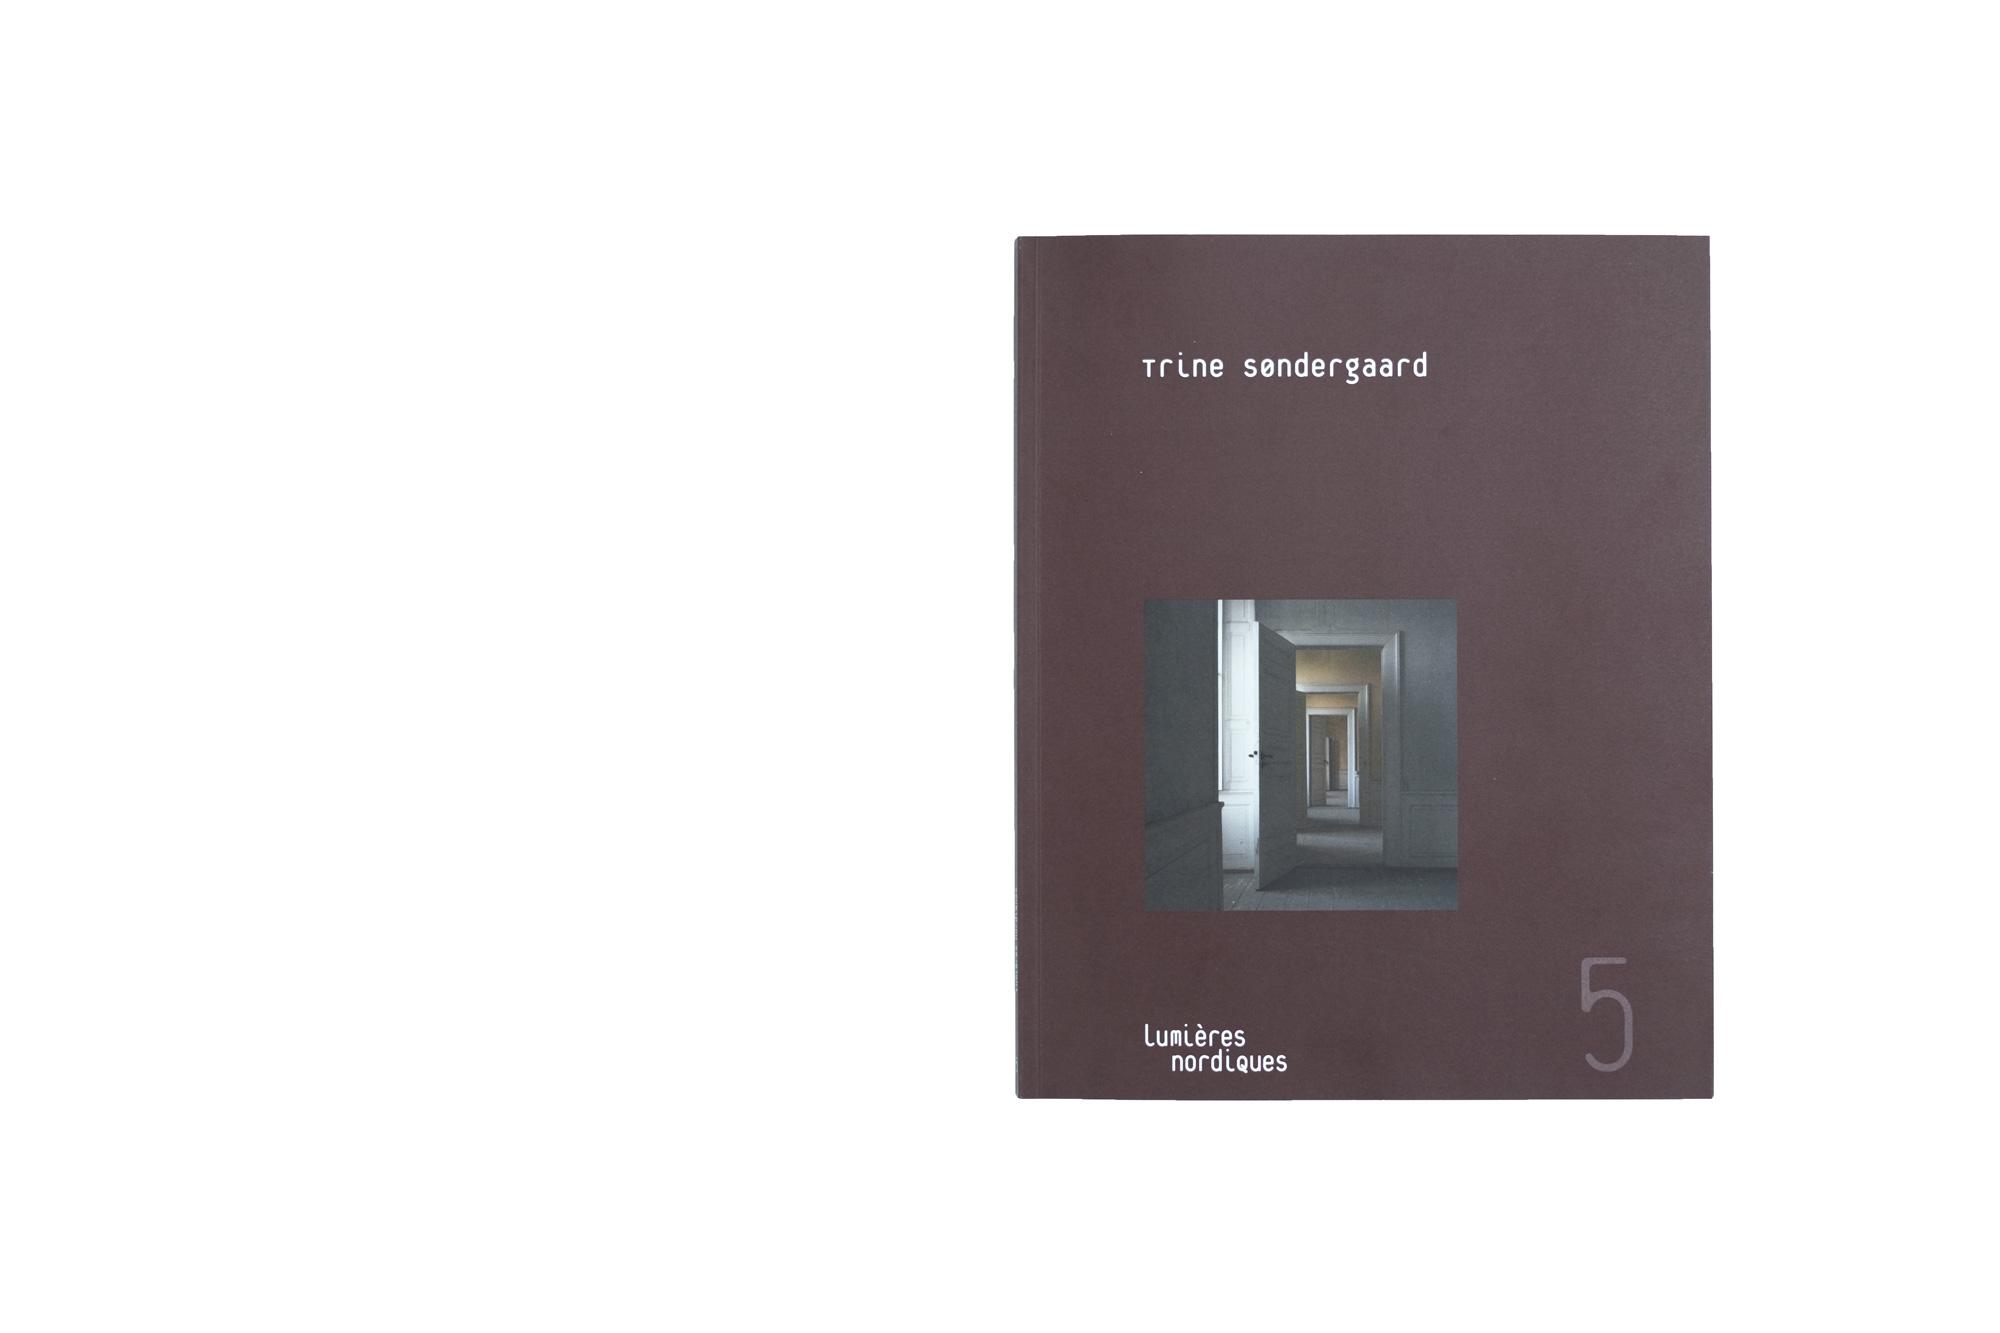 trine_sondergaard_lumieres_nordiques_cover_book2